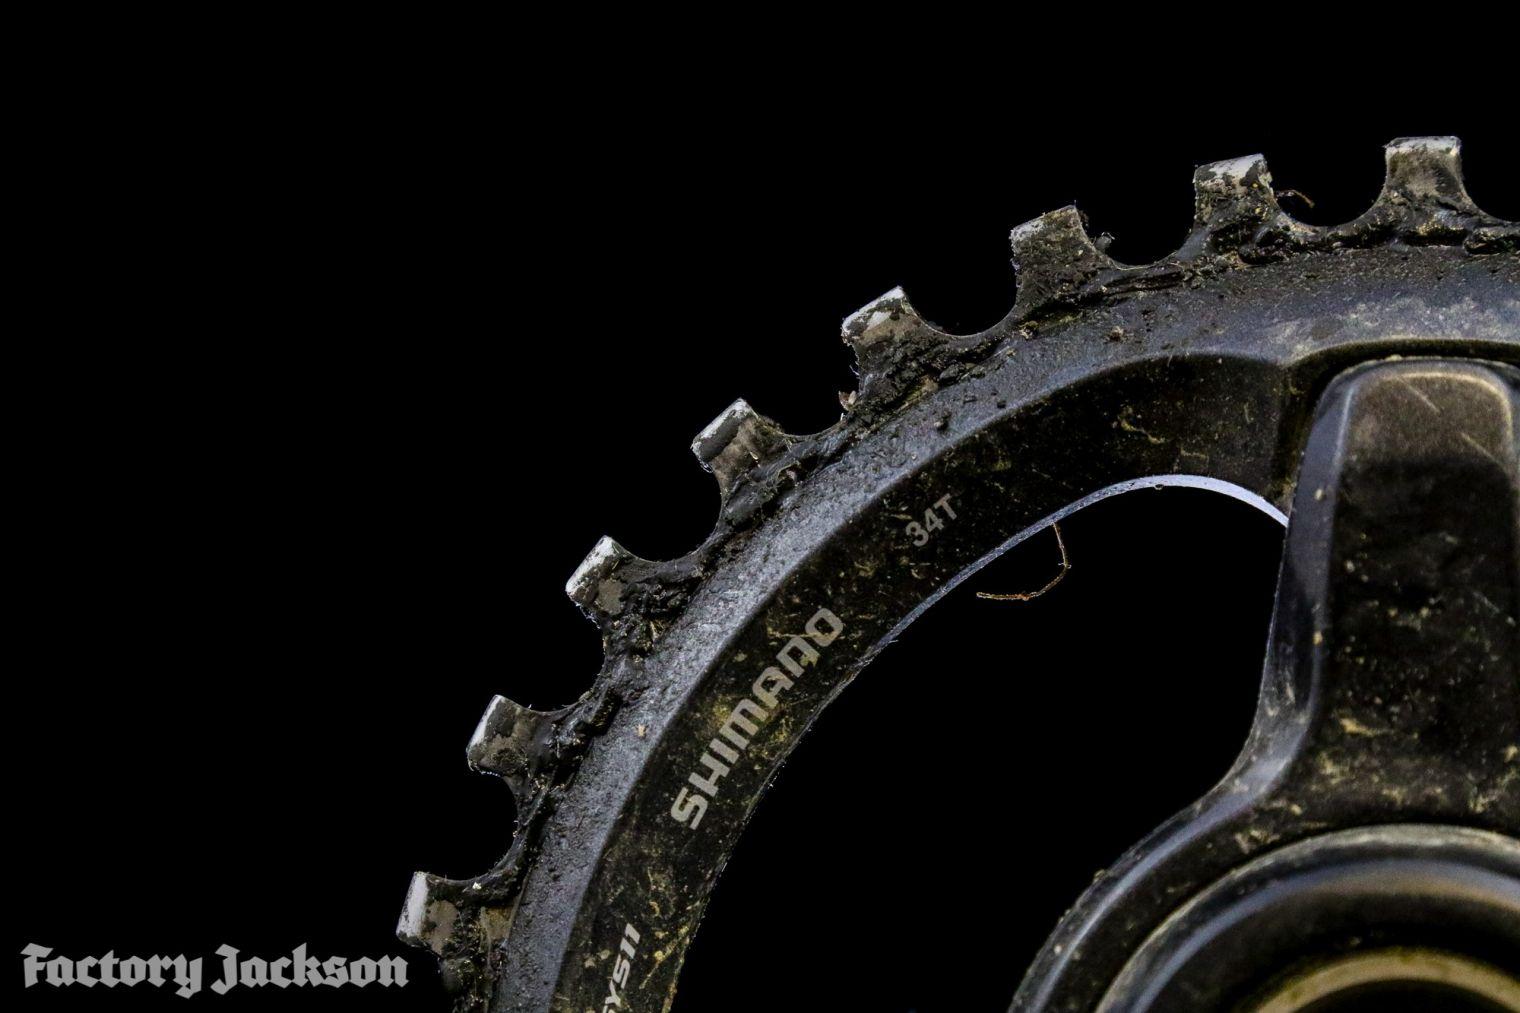 Factory Jackson retina photography